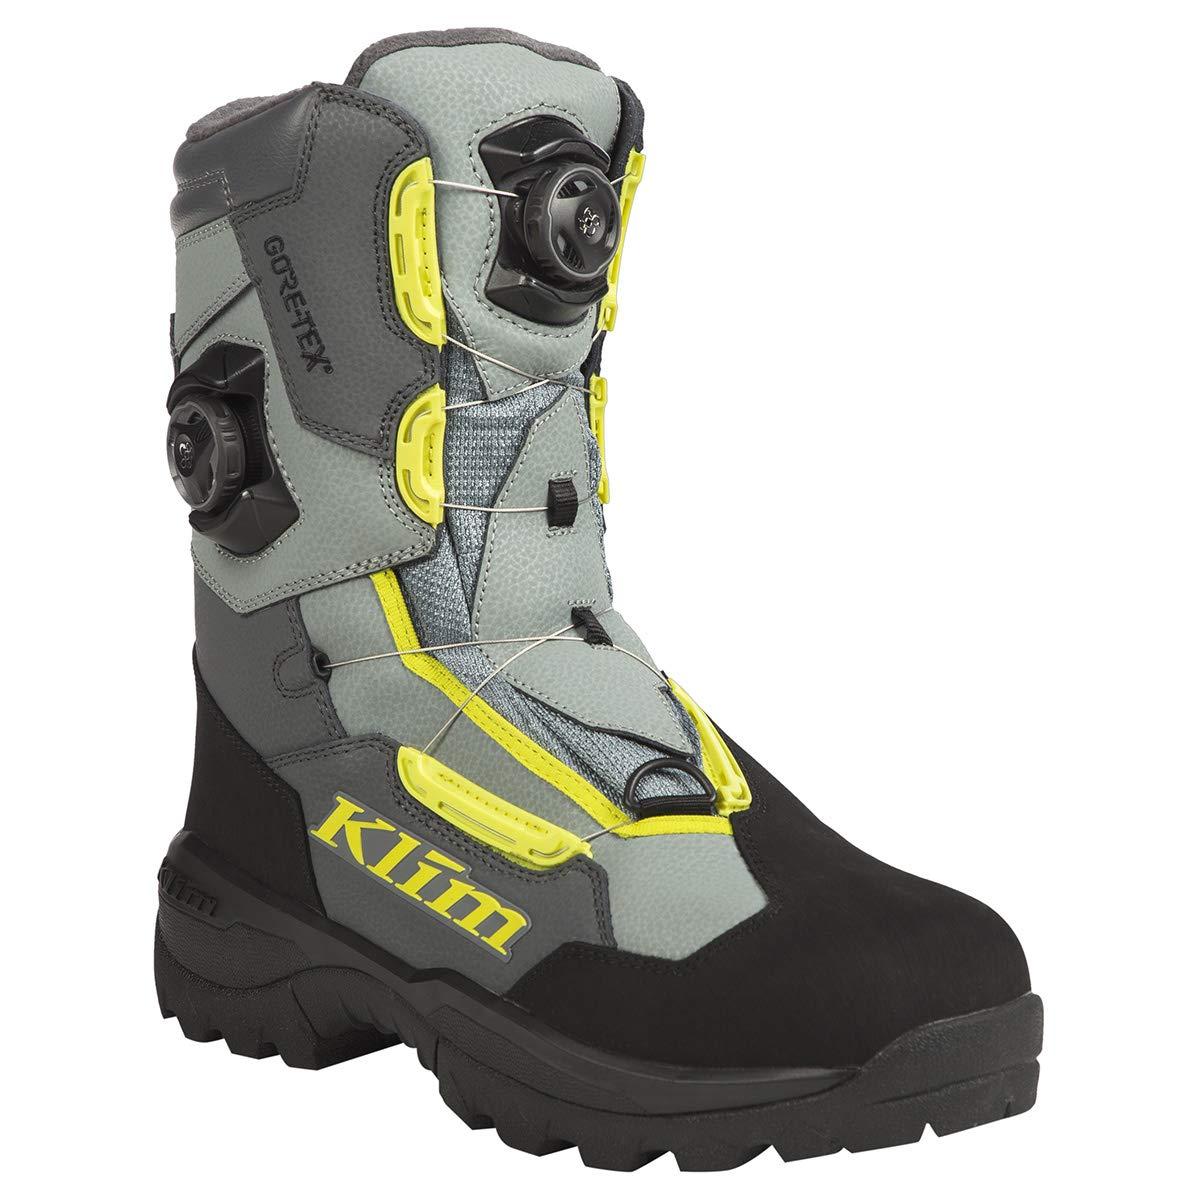 KLIM Adrenaline Pro GTX BOA Boot 8 Hi-Vis 3107-001-008-500